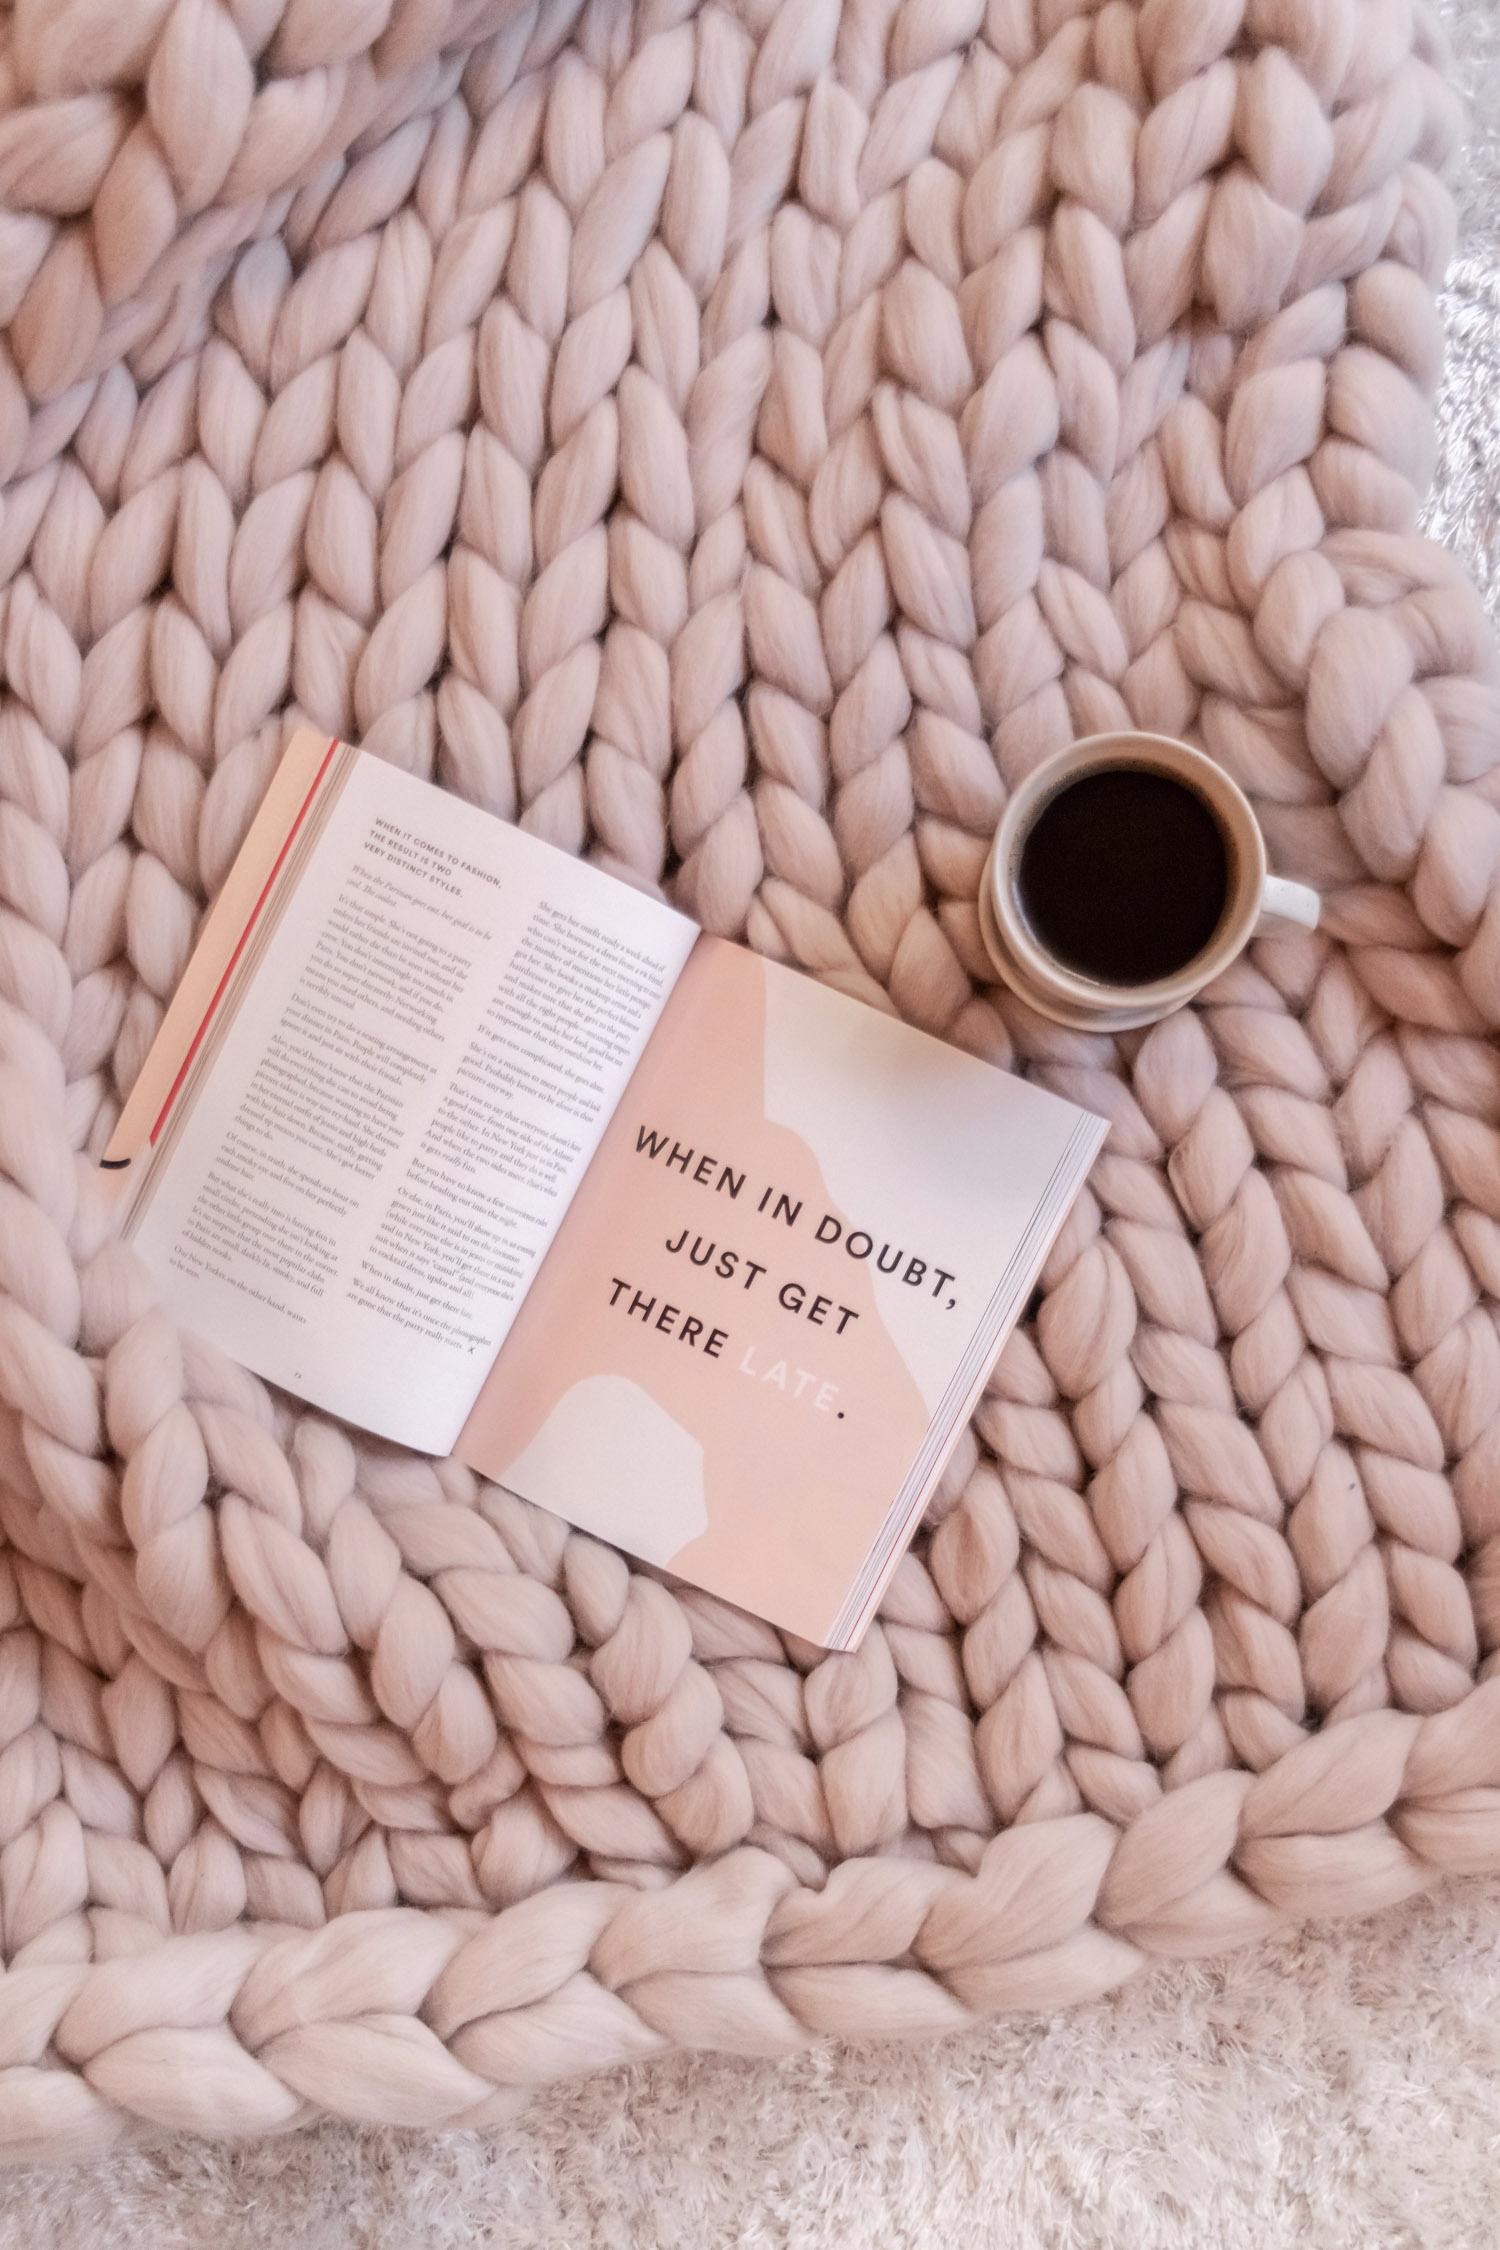 Chunky Knit Throw Blanket + Book & Coffee